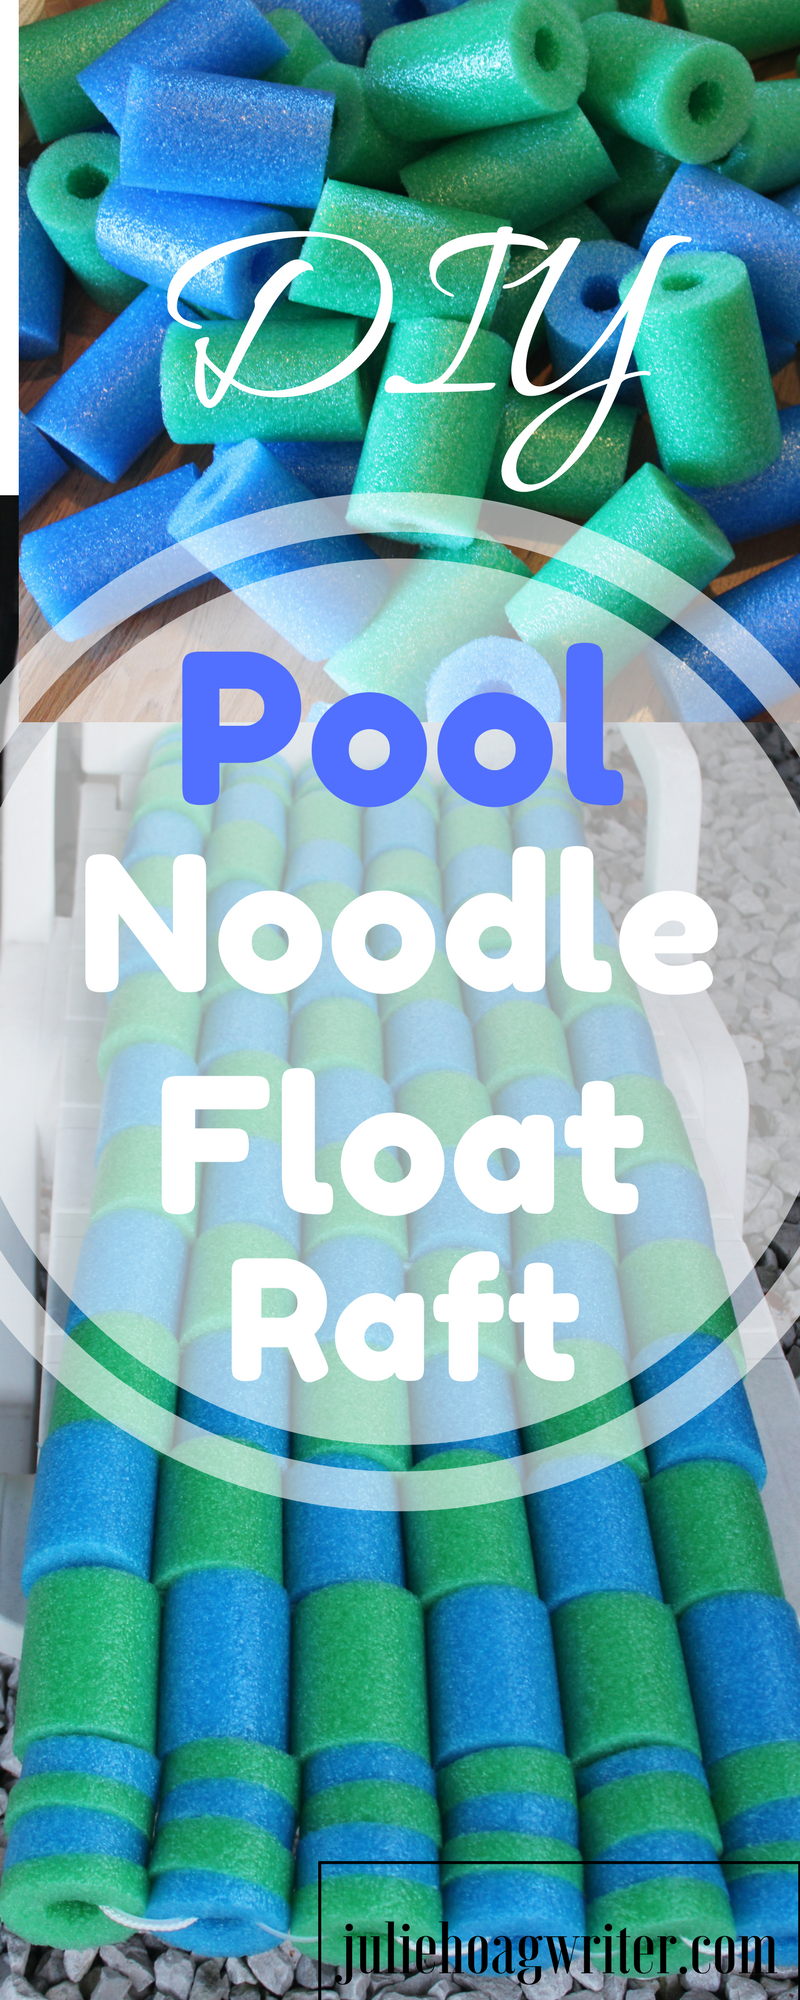 Diy Raining Men Costume: DIY Pool Noodle Float Raft